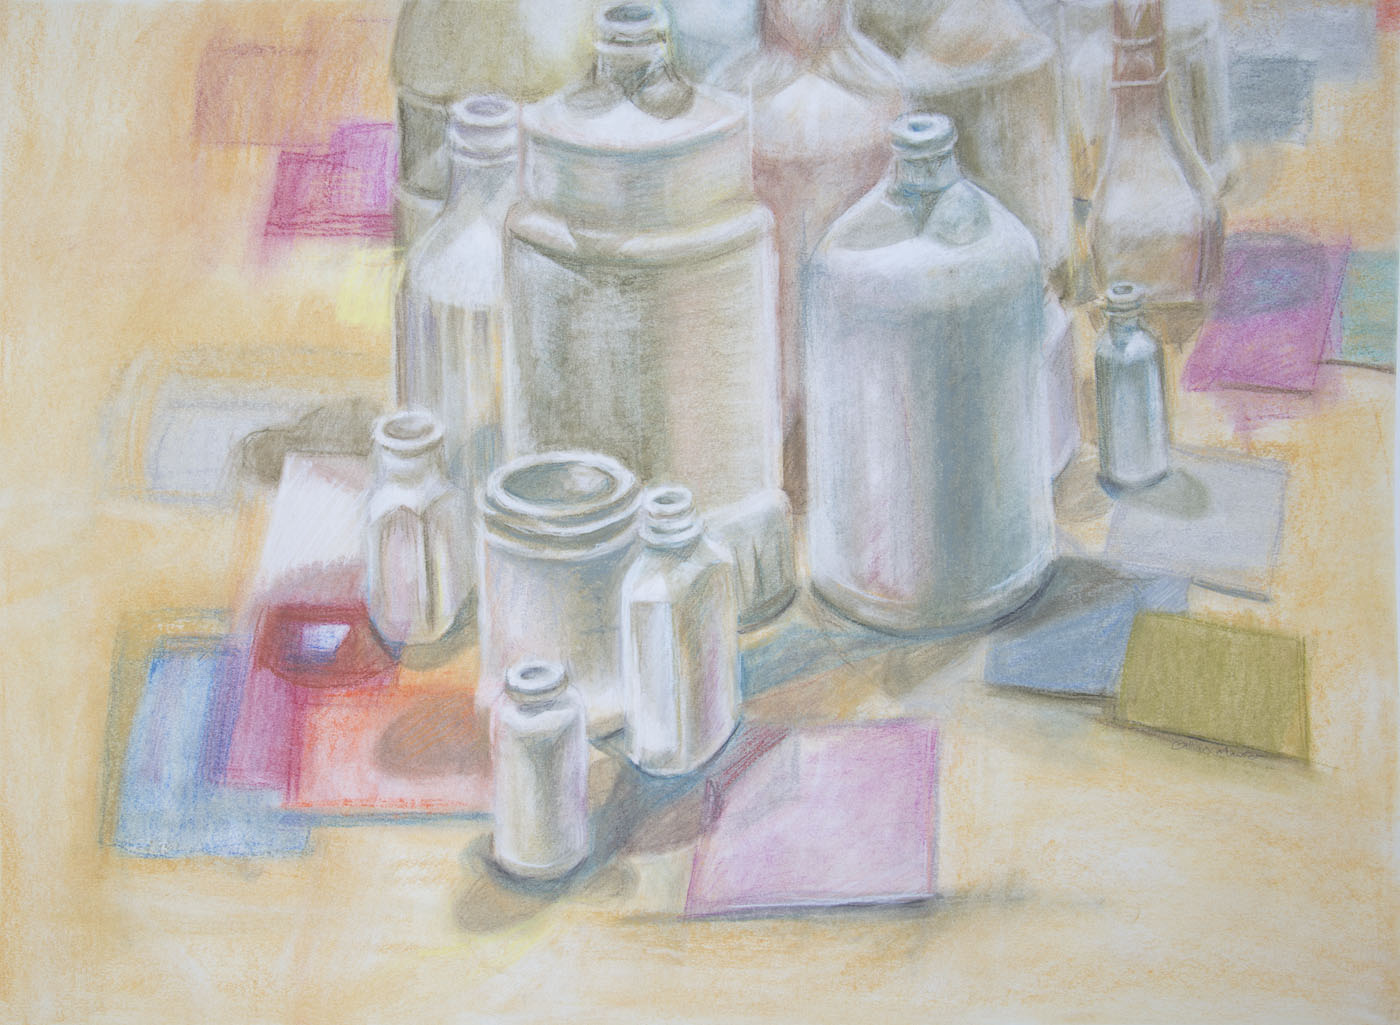 """Bottle Study"" Chalk Pastel on Paper. 2018. Gillian Maurer."